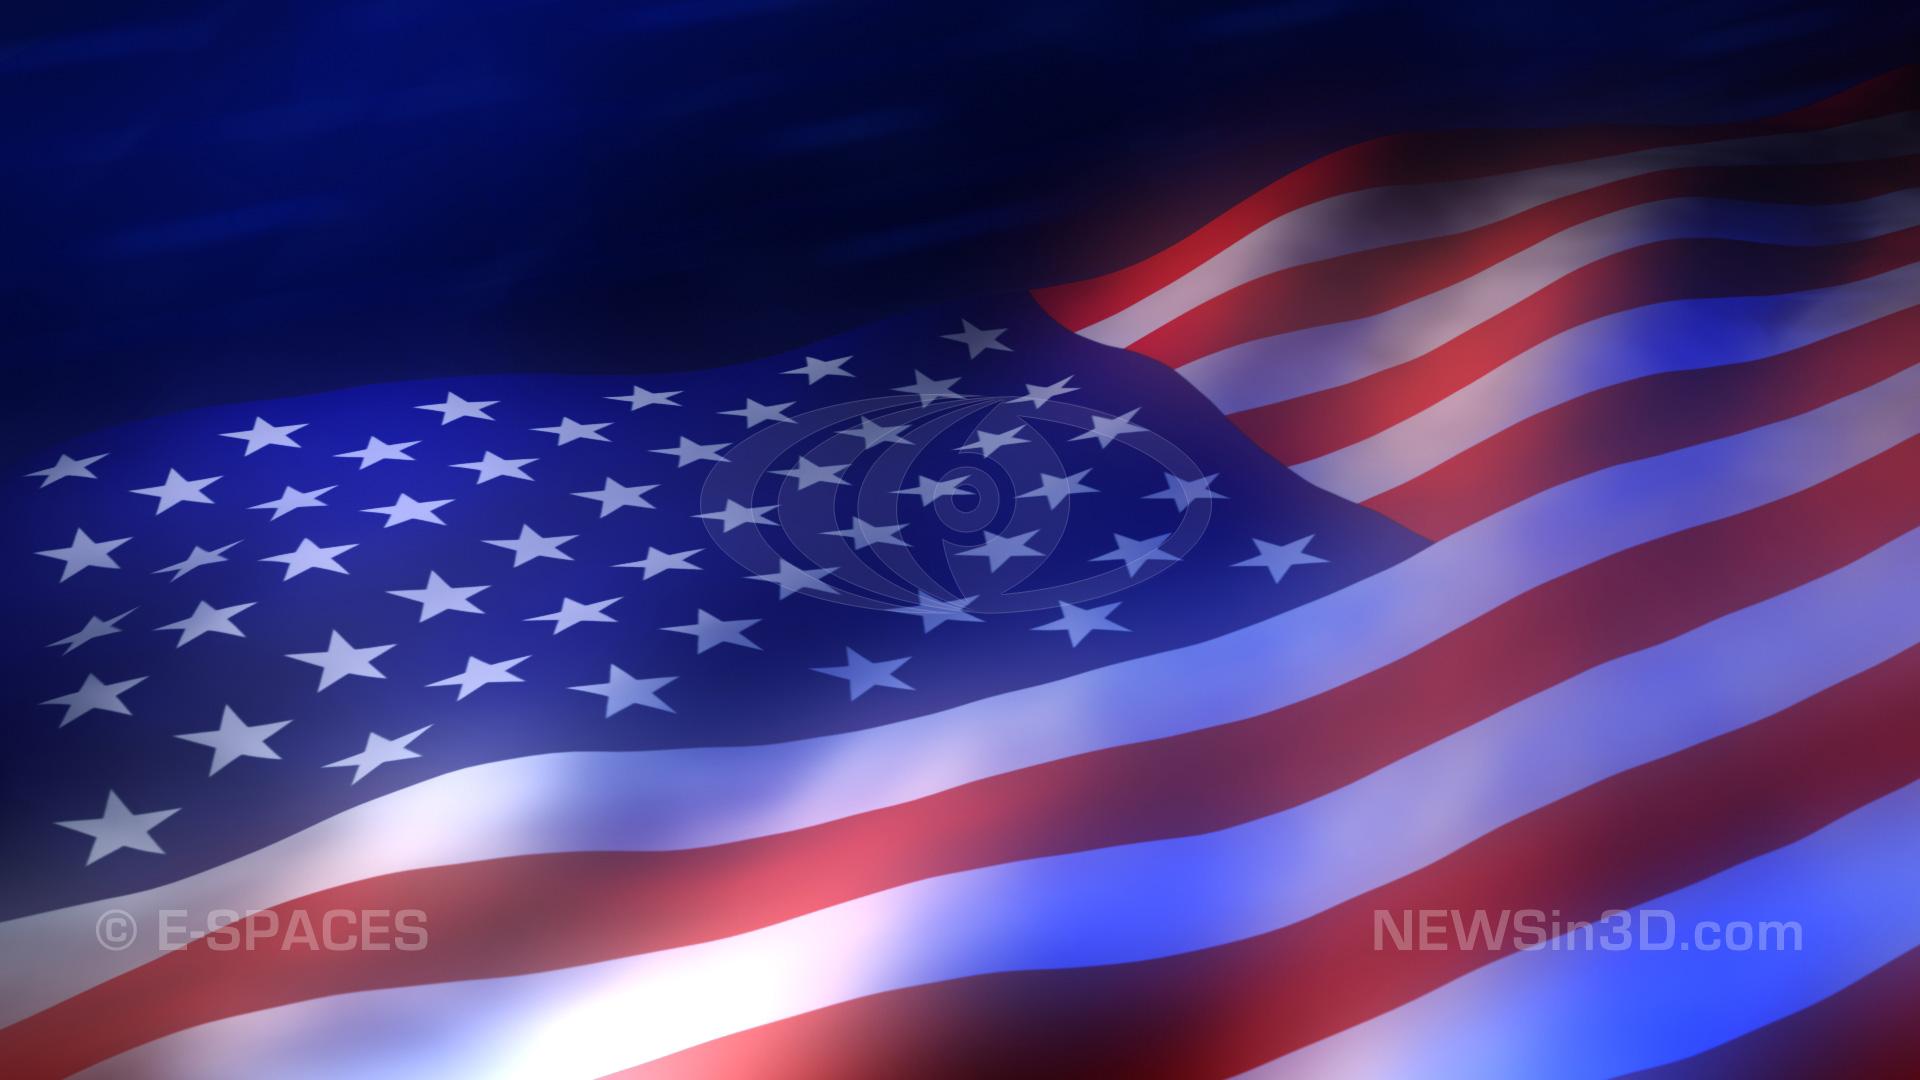 hd background american flagjpg 1920x1080